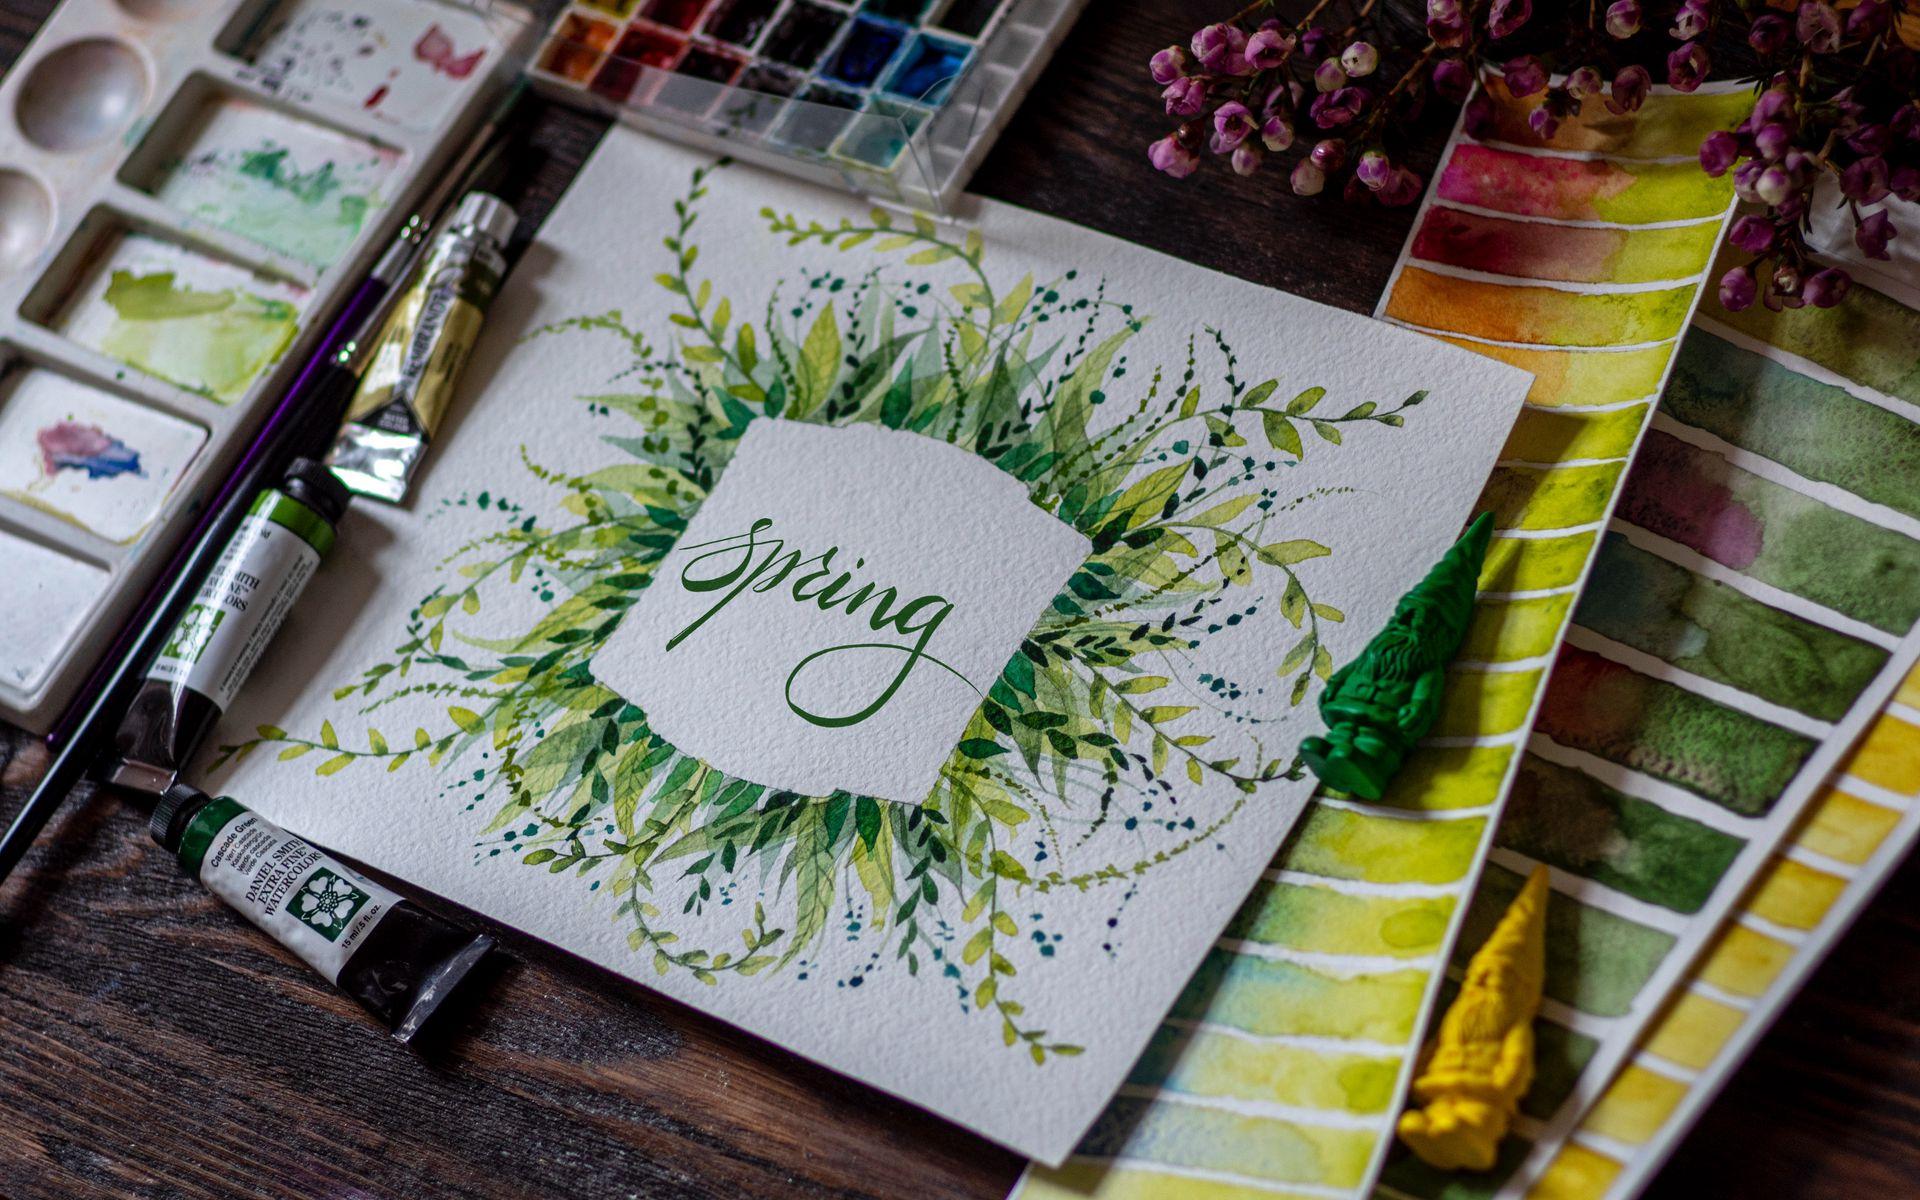 1920x1200 Обои весна, слово, леттеринг, краски, акварель